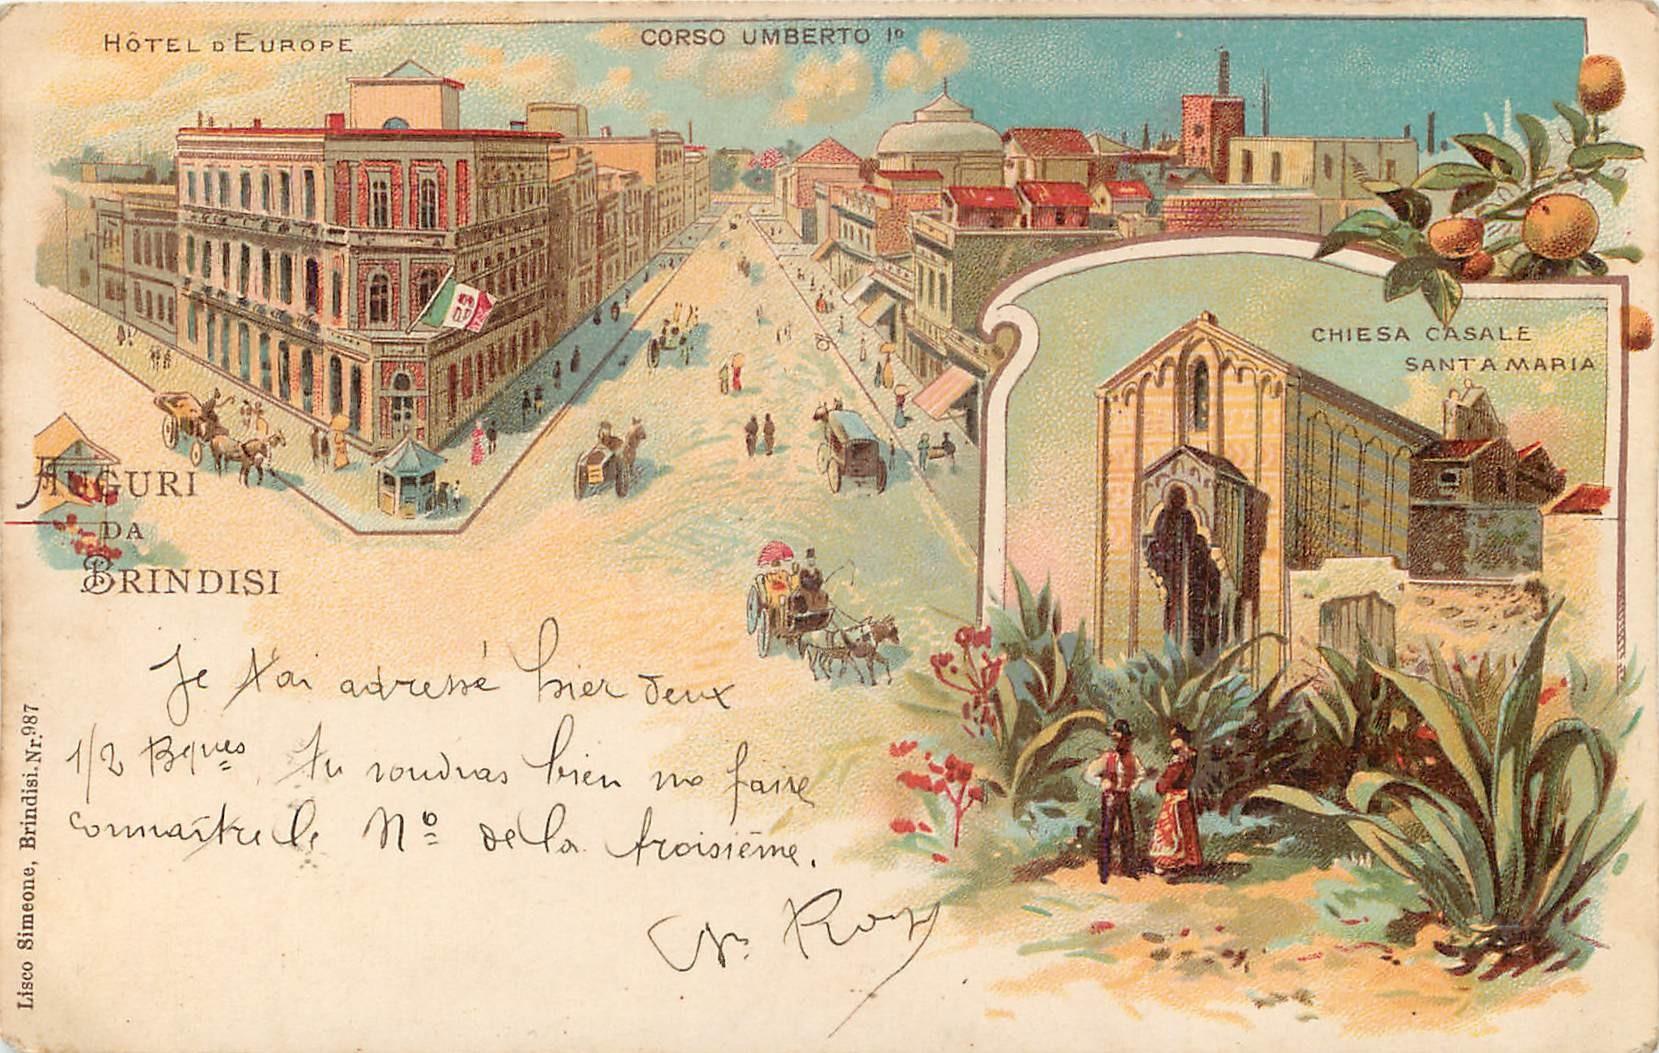 BRINDISI. Hôtel Europe corso Umberto I° et Chiesa 1905